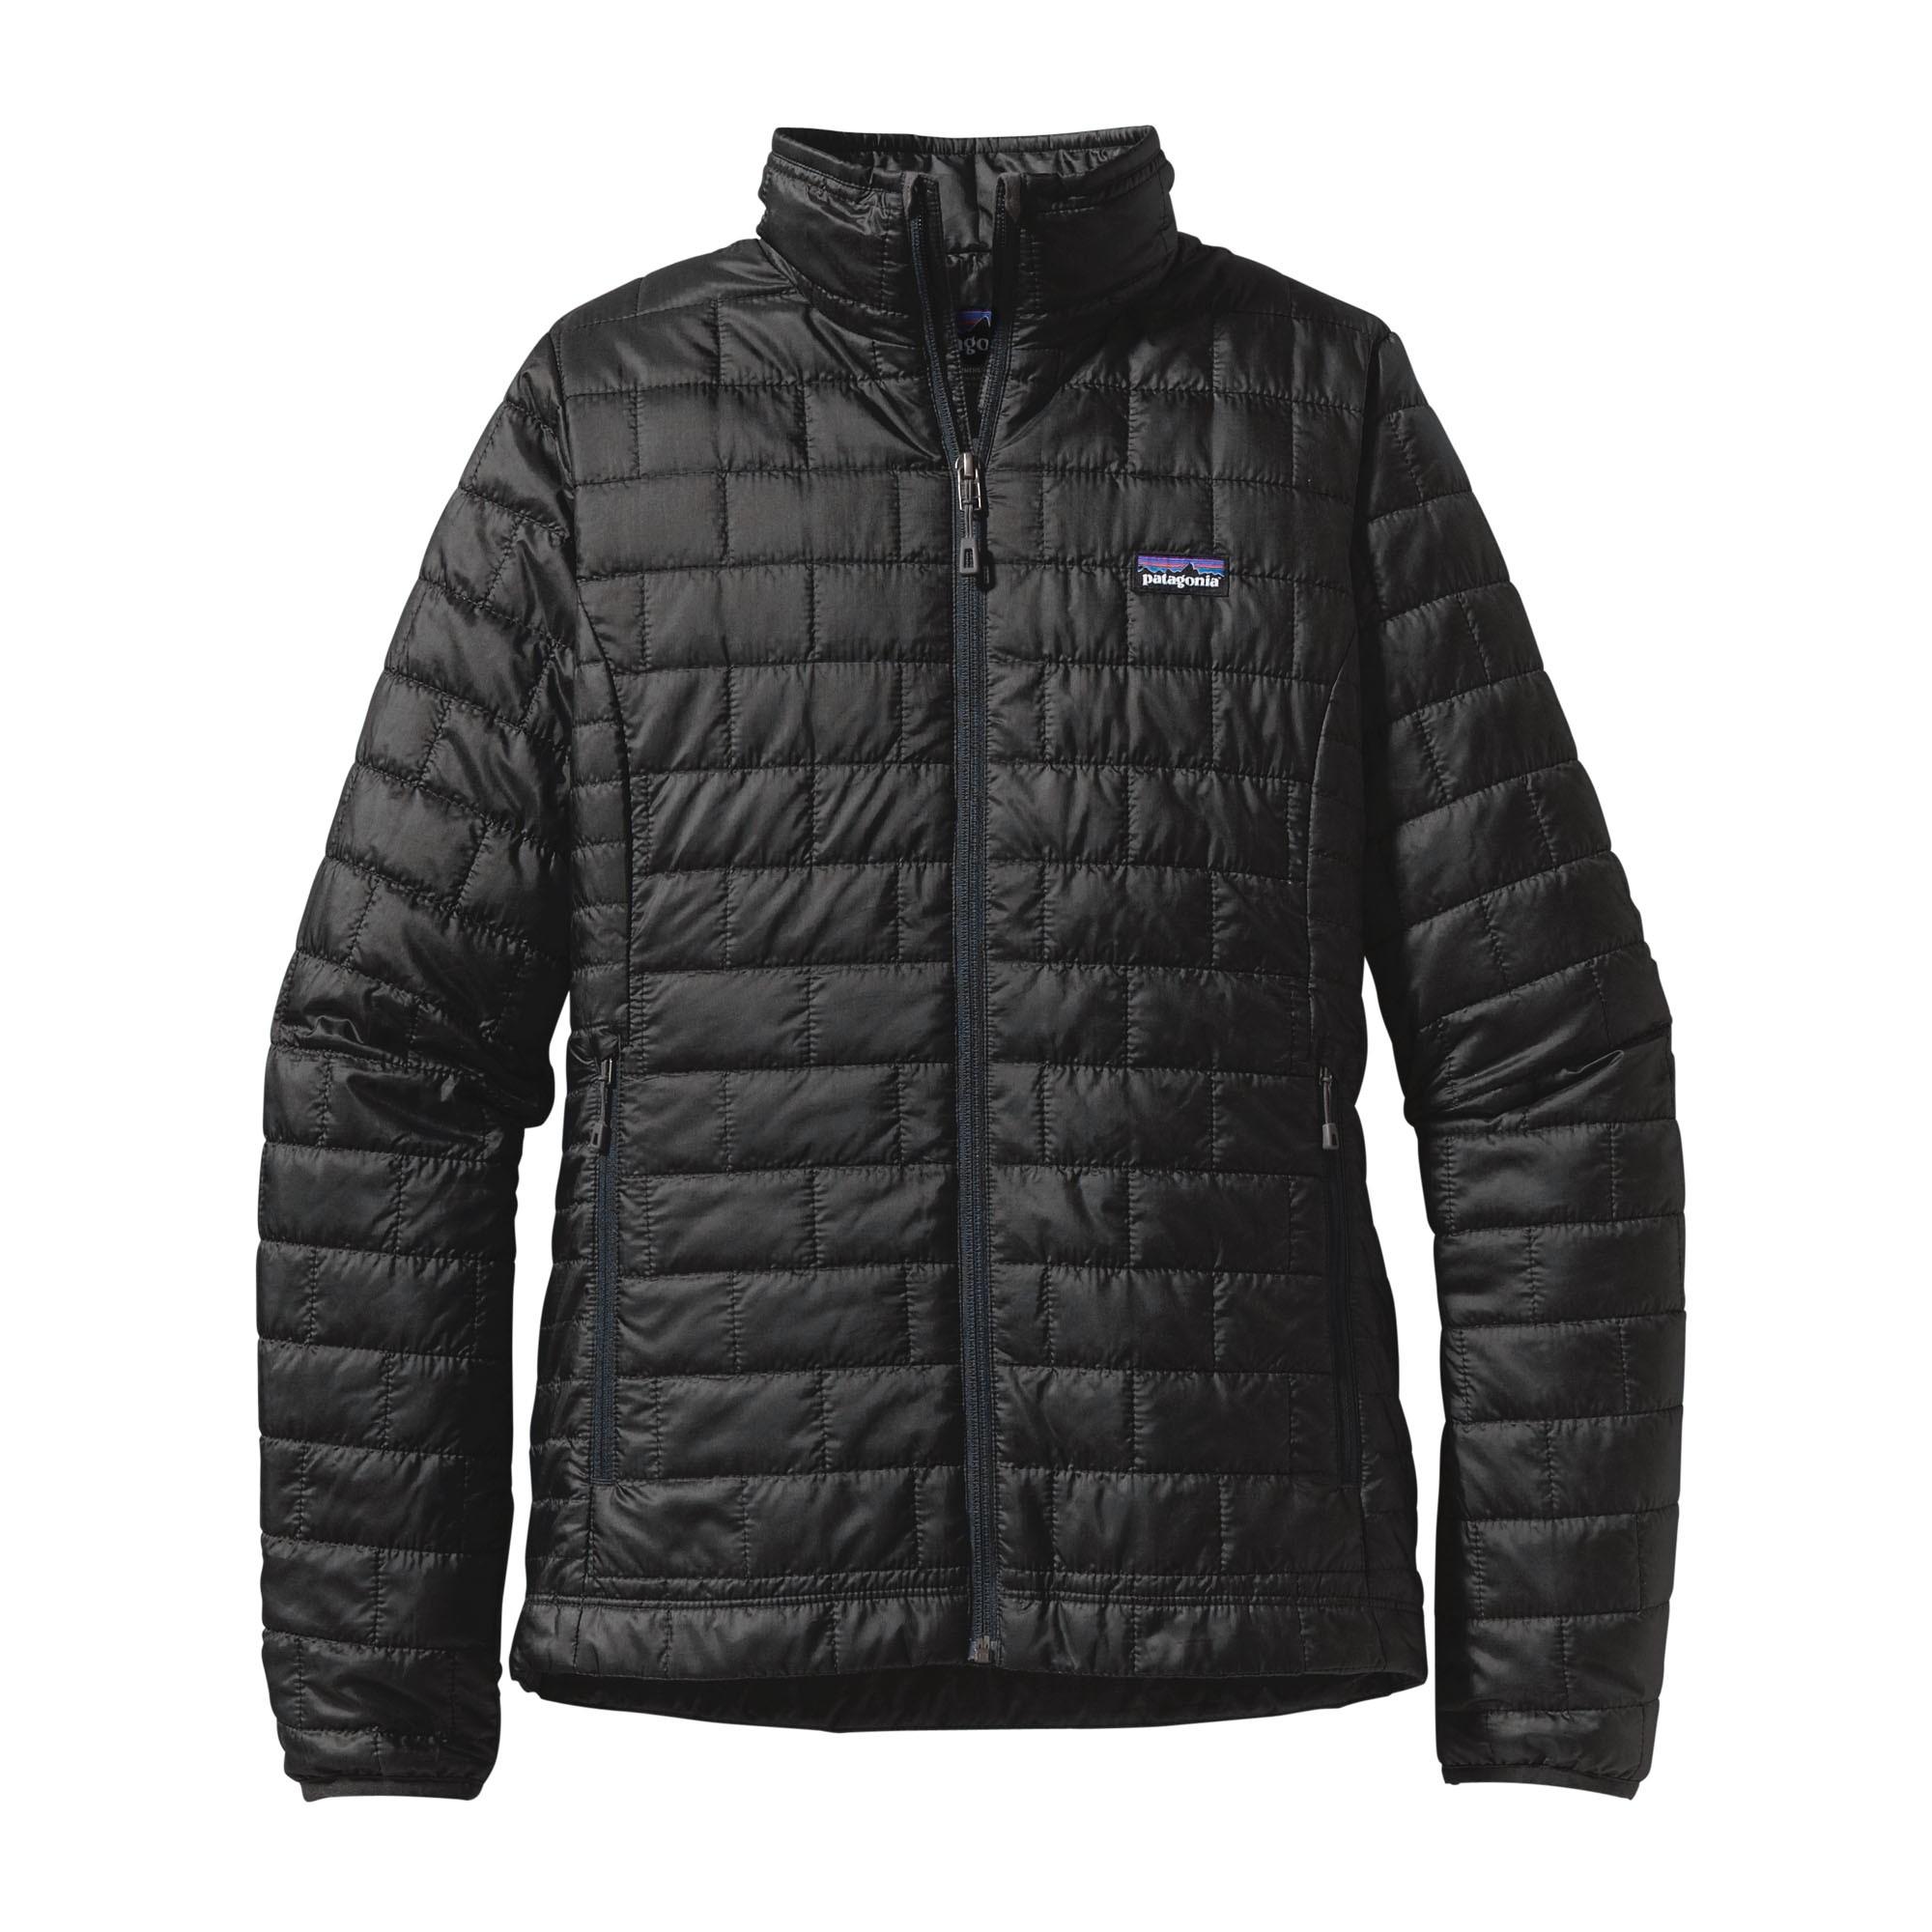 Patagonia Women's Nano Puff® Jacket : Black